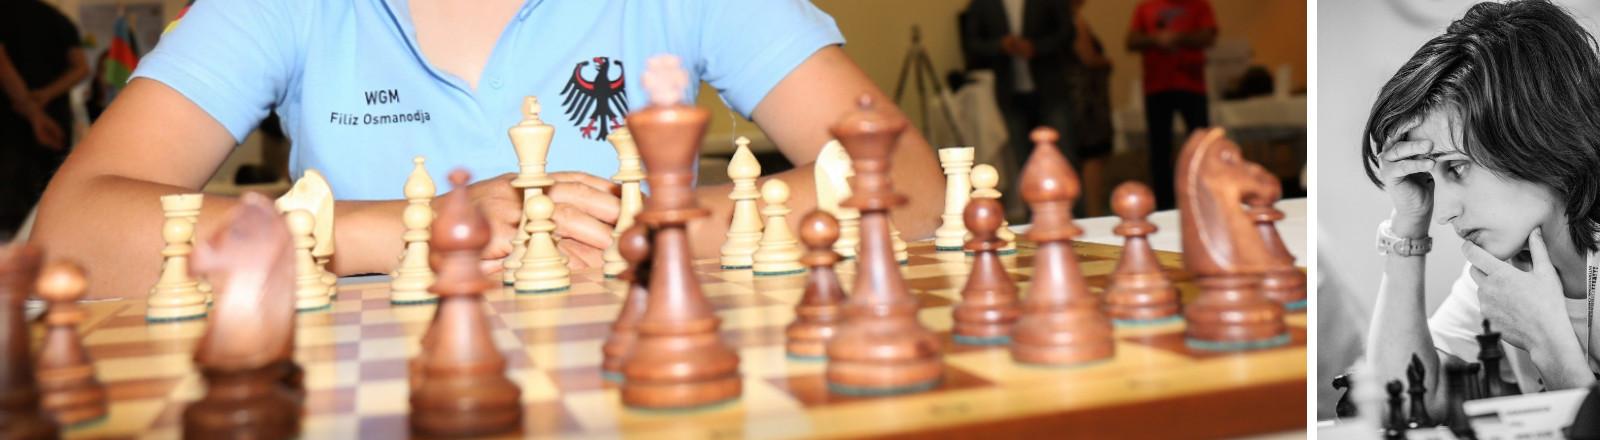 Filiz Osmanodja, Schach-Großmeisterin